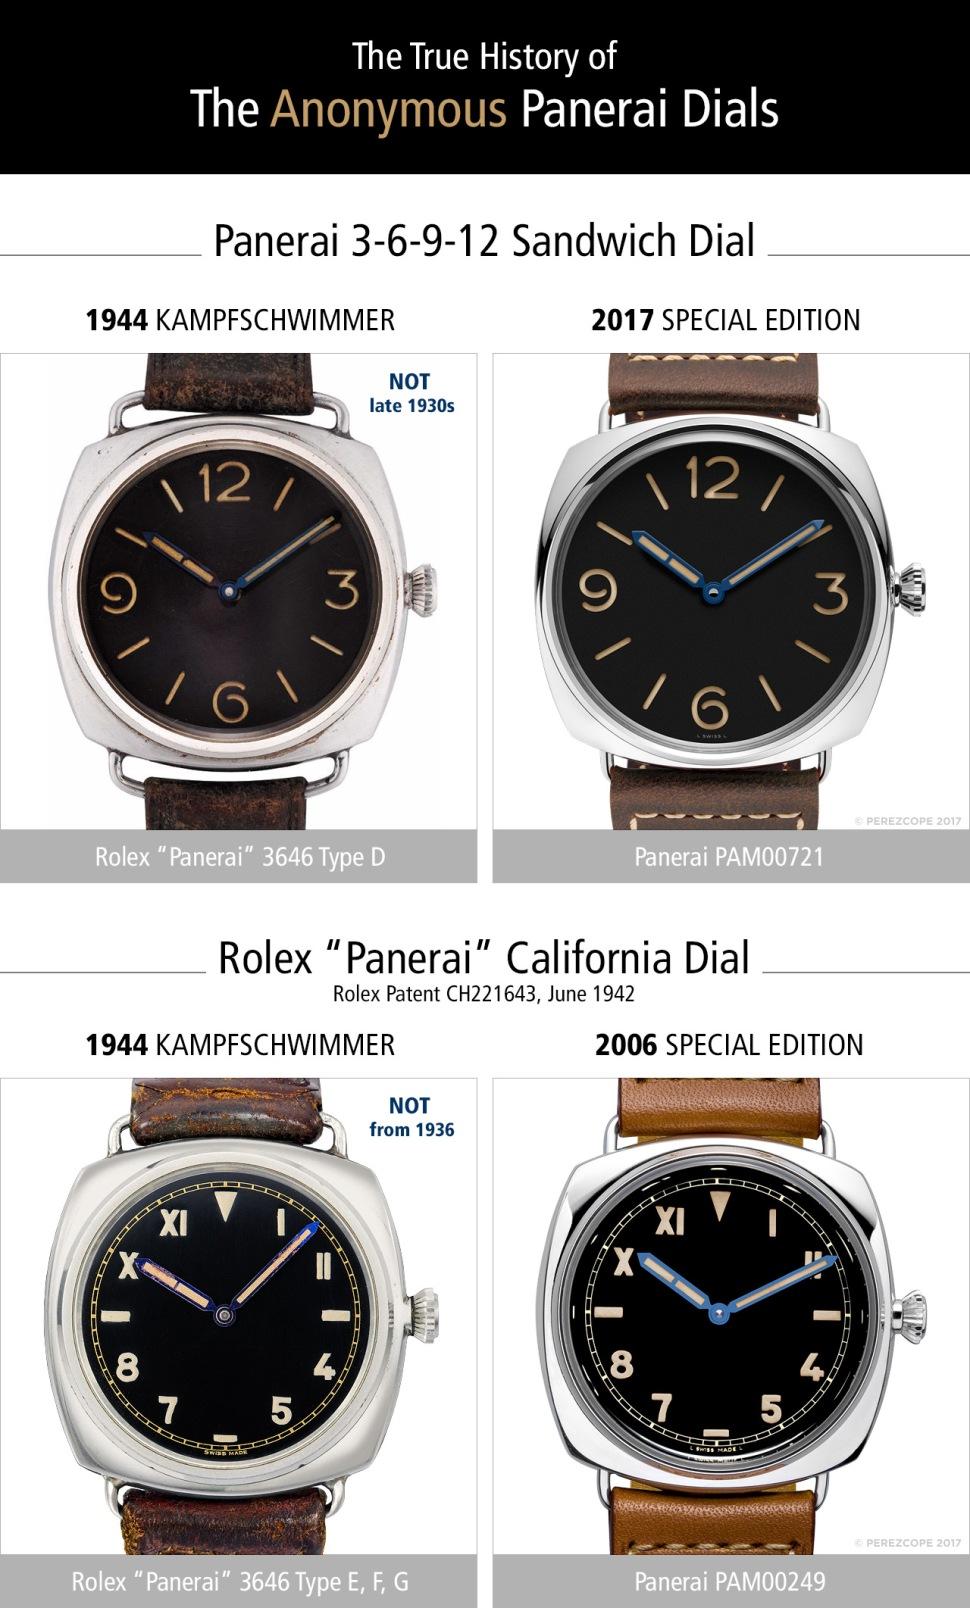 171212-info-panerai-anonymous-dials